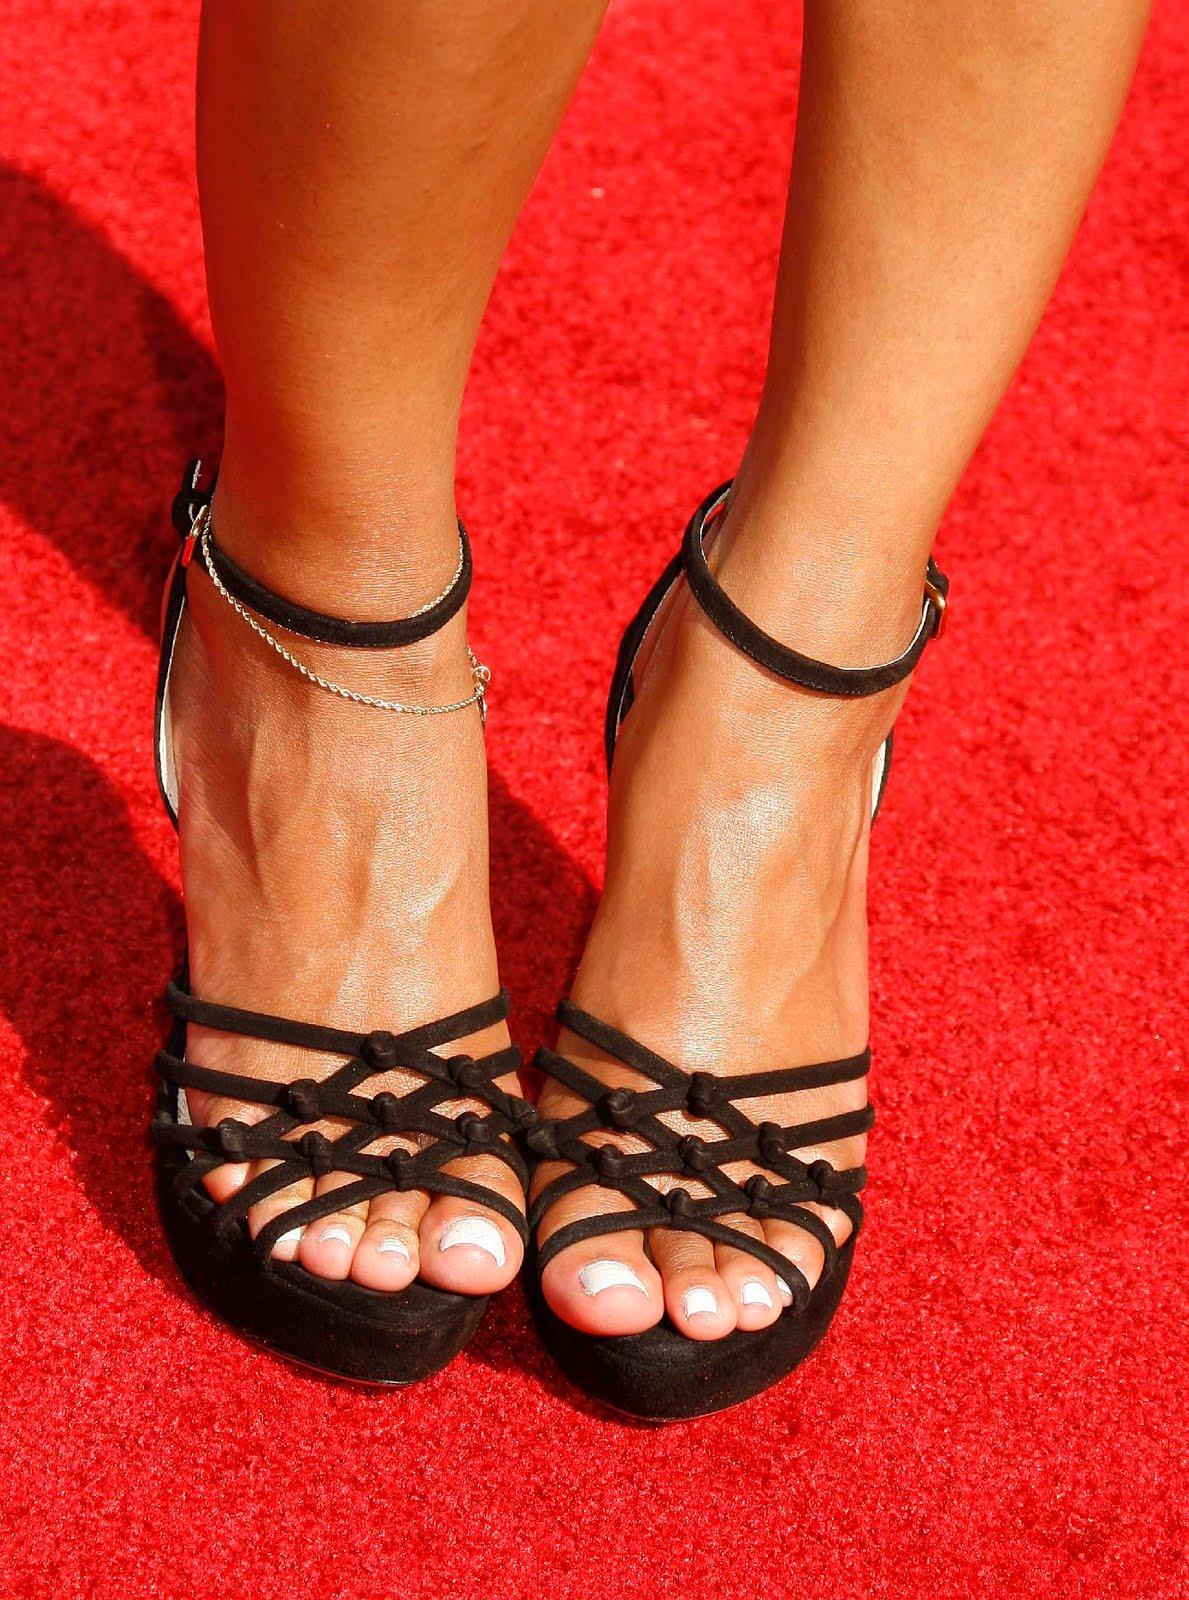 http://3.bp.blogspot.com/_UaLWp72nij4/TAgMlNm0QnI/AAAAAAAANmY/kkKzePRwbS8/s1600/meagan-good-feet-3.jpg